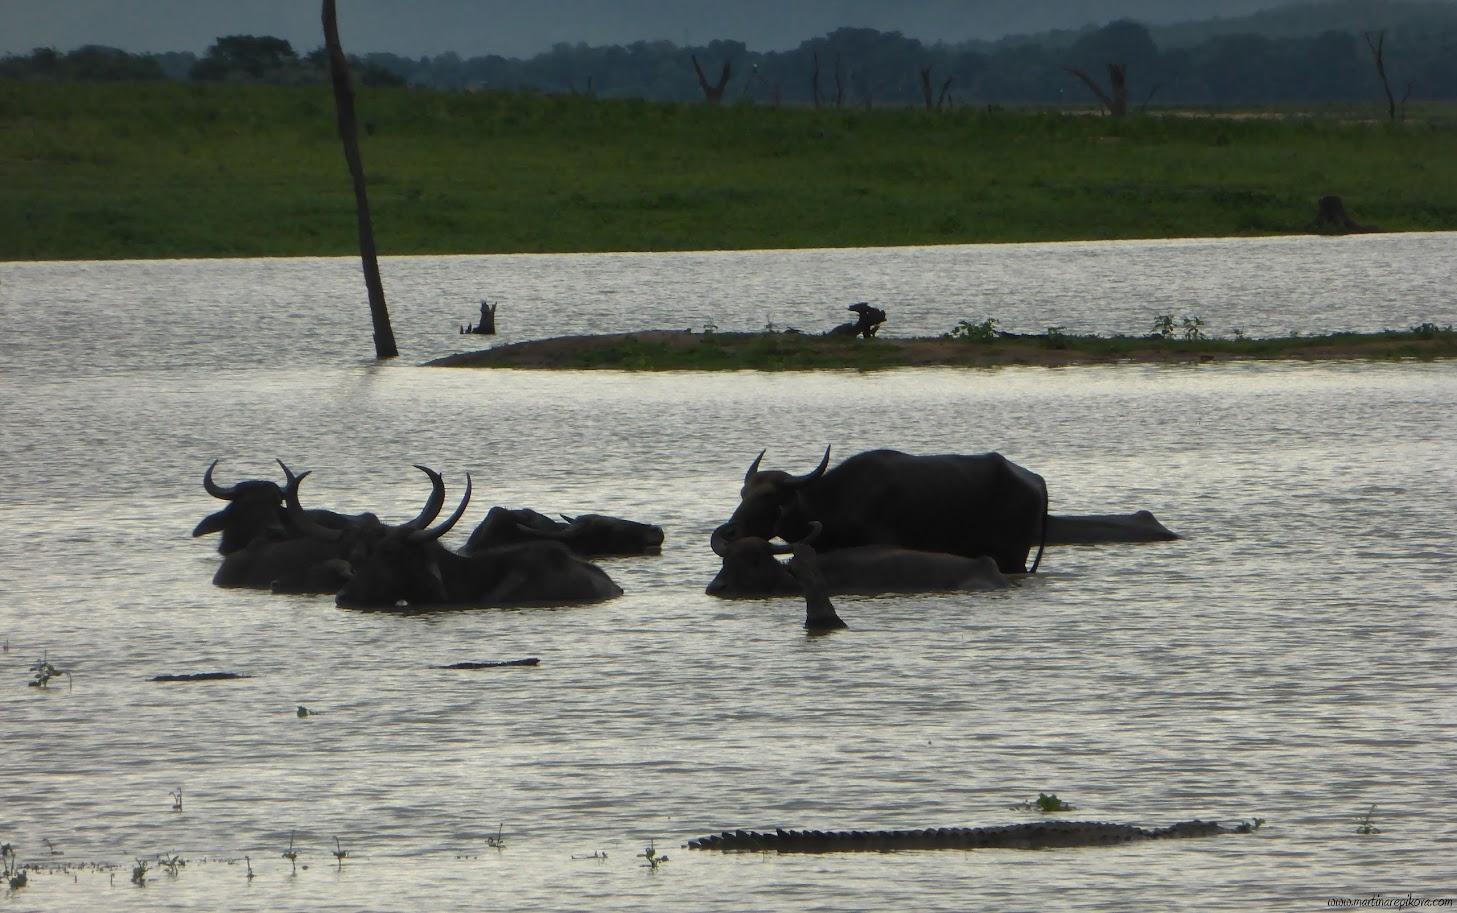 Crocodile and Water buffaloes in Uda Walawe reservoir, Sri Lanka